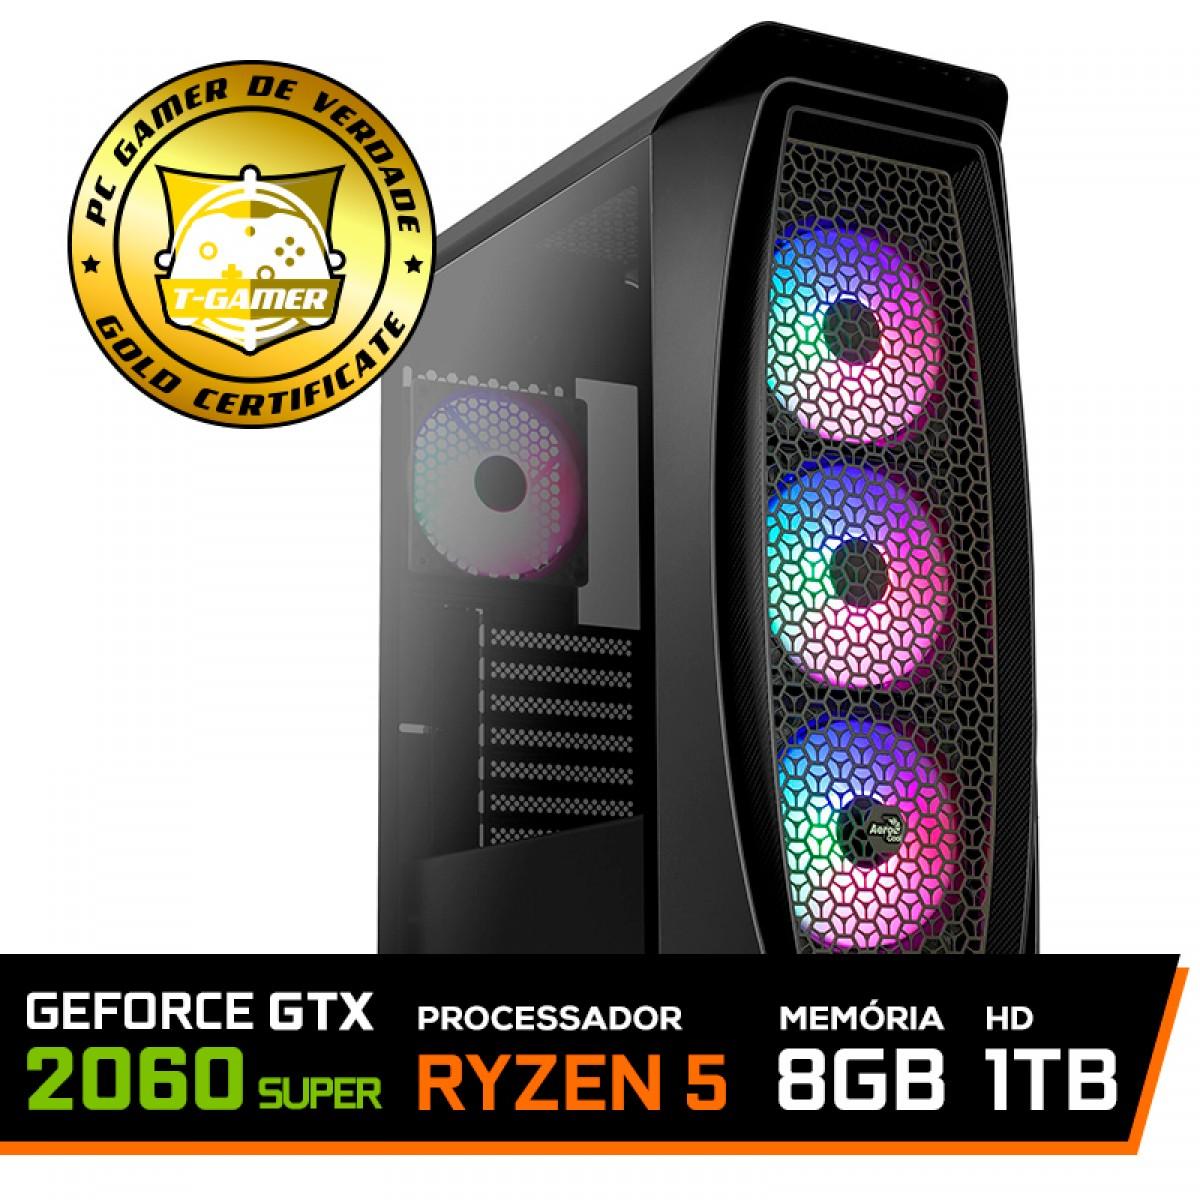 Pc Gamer T-General Lvl-6 Amd Ryzen 5 3600 / GeForce RTX 2060 Super / DDR4 8GB / HD 1TB / 600W